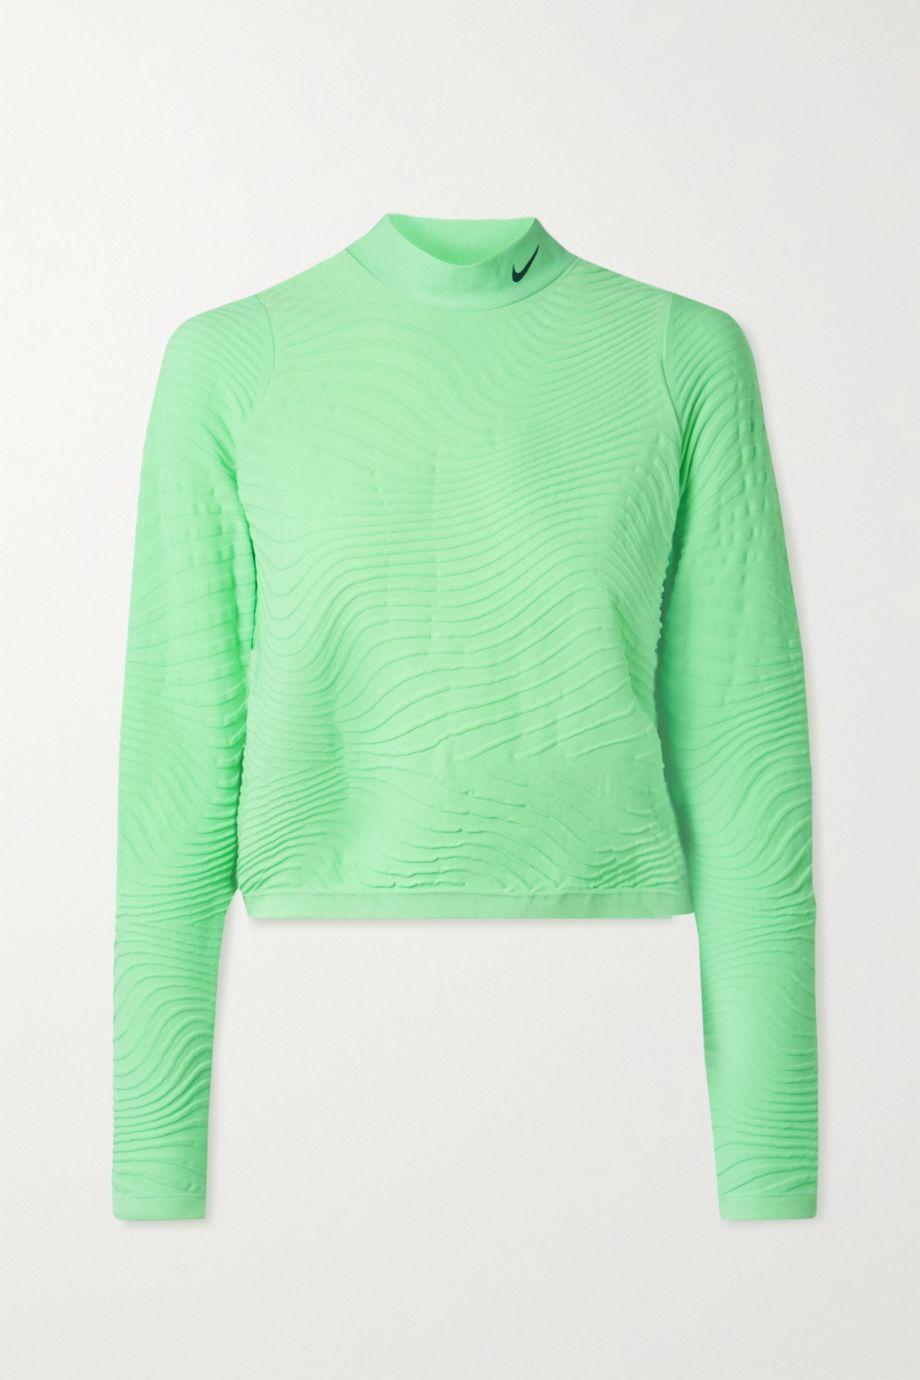 Nike City Ready jacquard-knit top